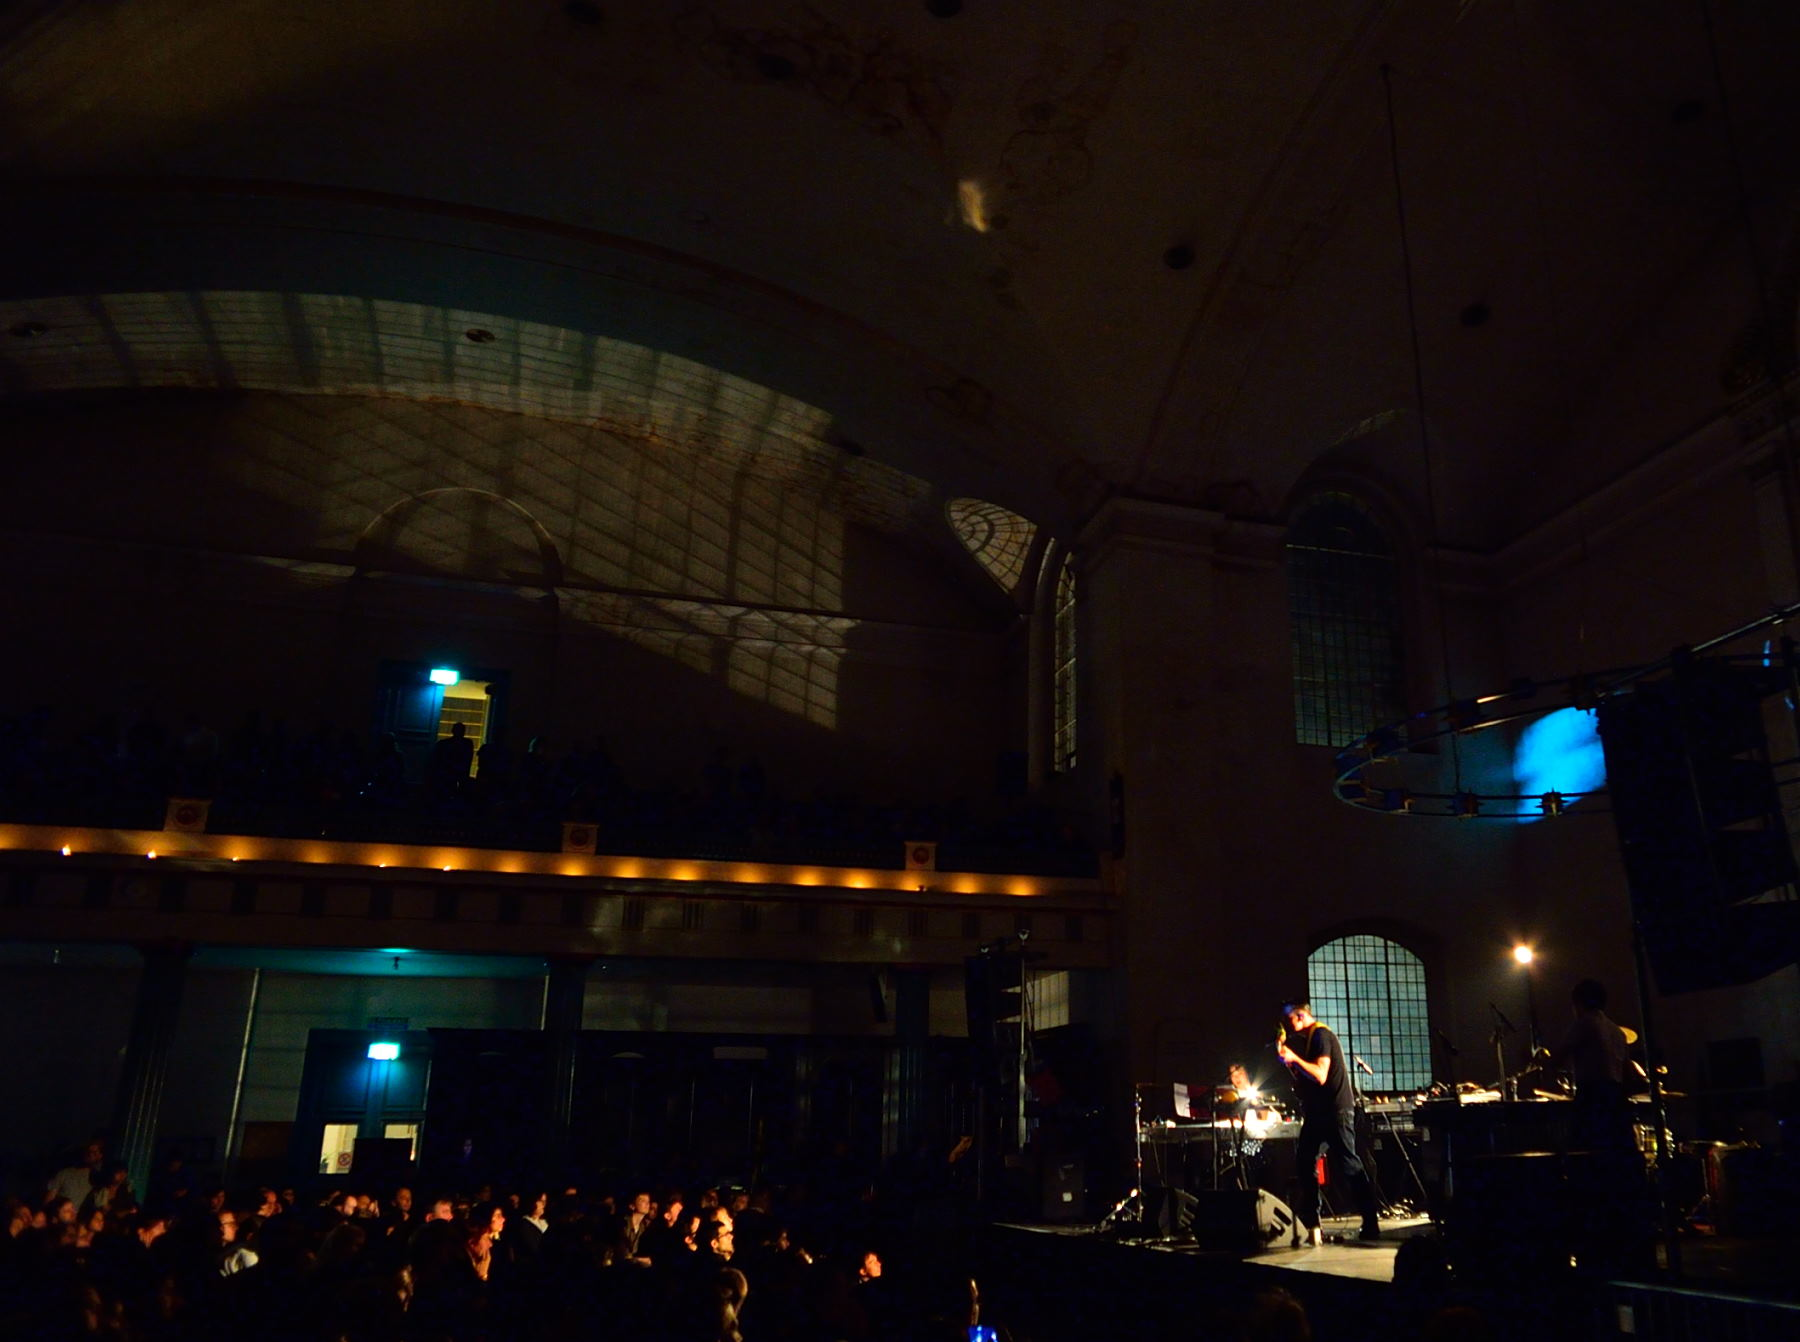 xiu xiu7 Live Review: Xiu Xiu plays the Music of Twin Peaks at Londons Saint John at Hackney (10/8)